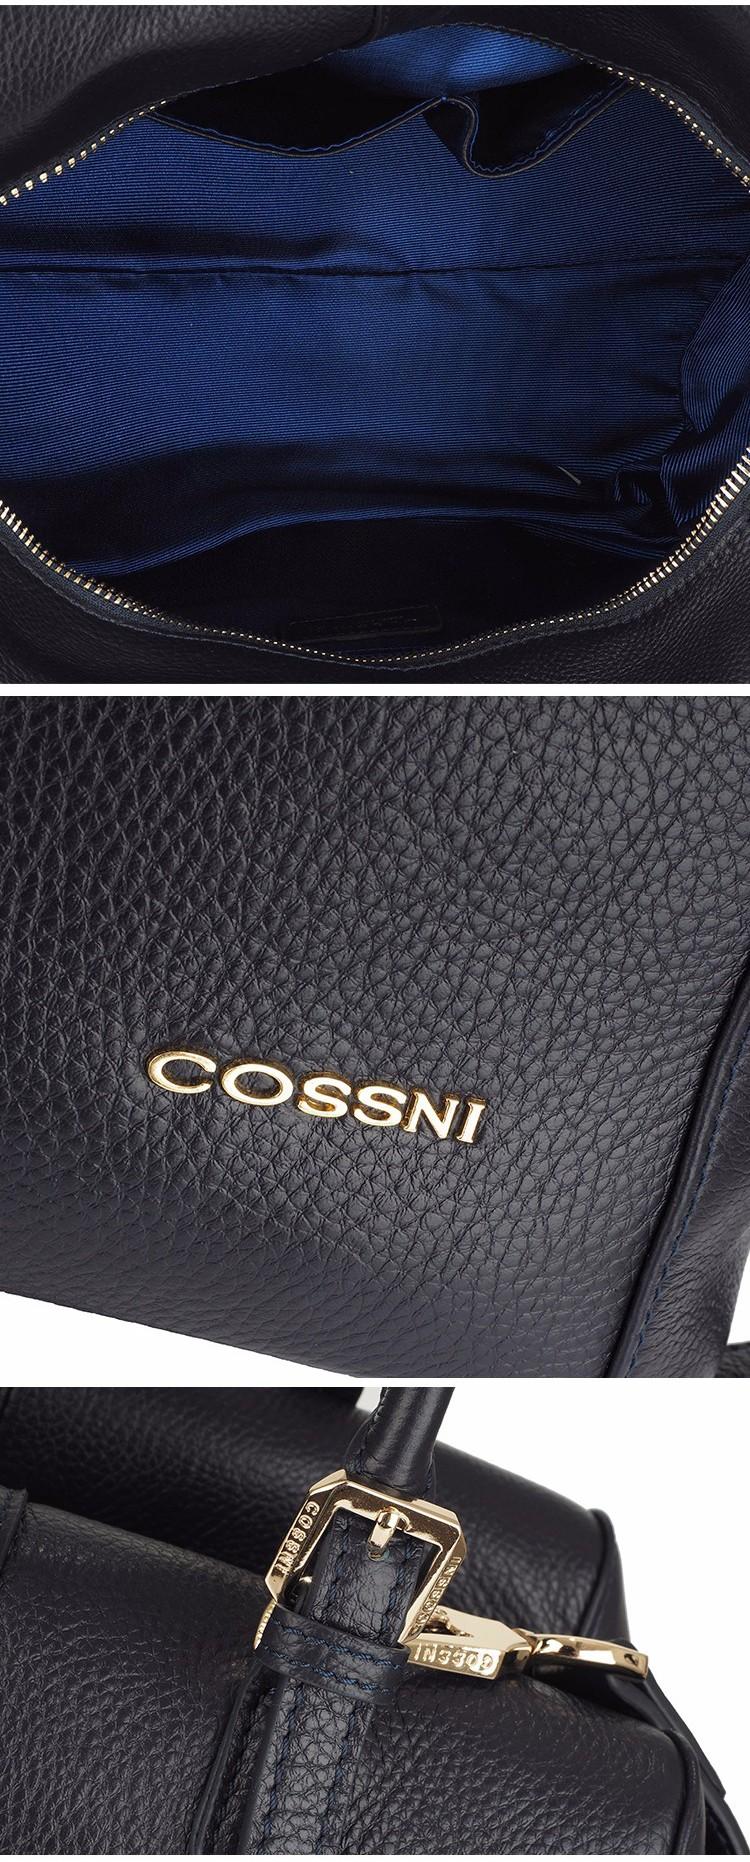 b18808ddaf China supplier ladies bag and purse best quality bag manufacturer leather  original brand handbags